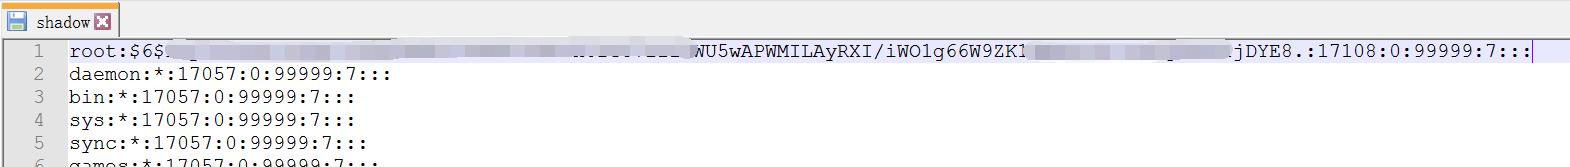 win10子系统linux修改root密码